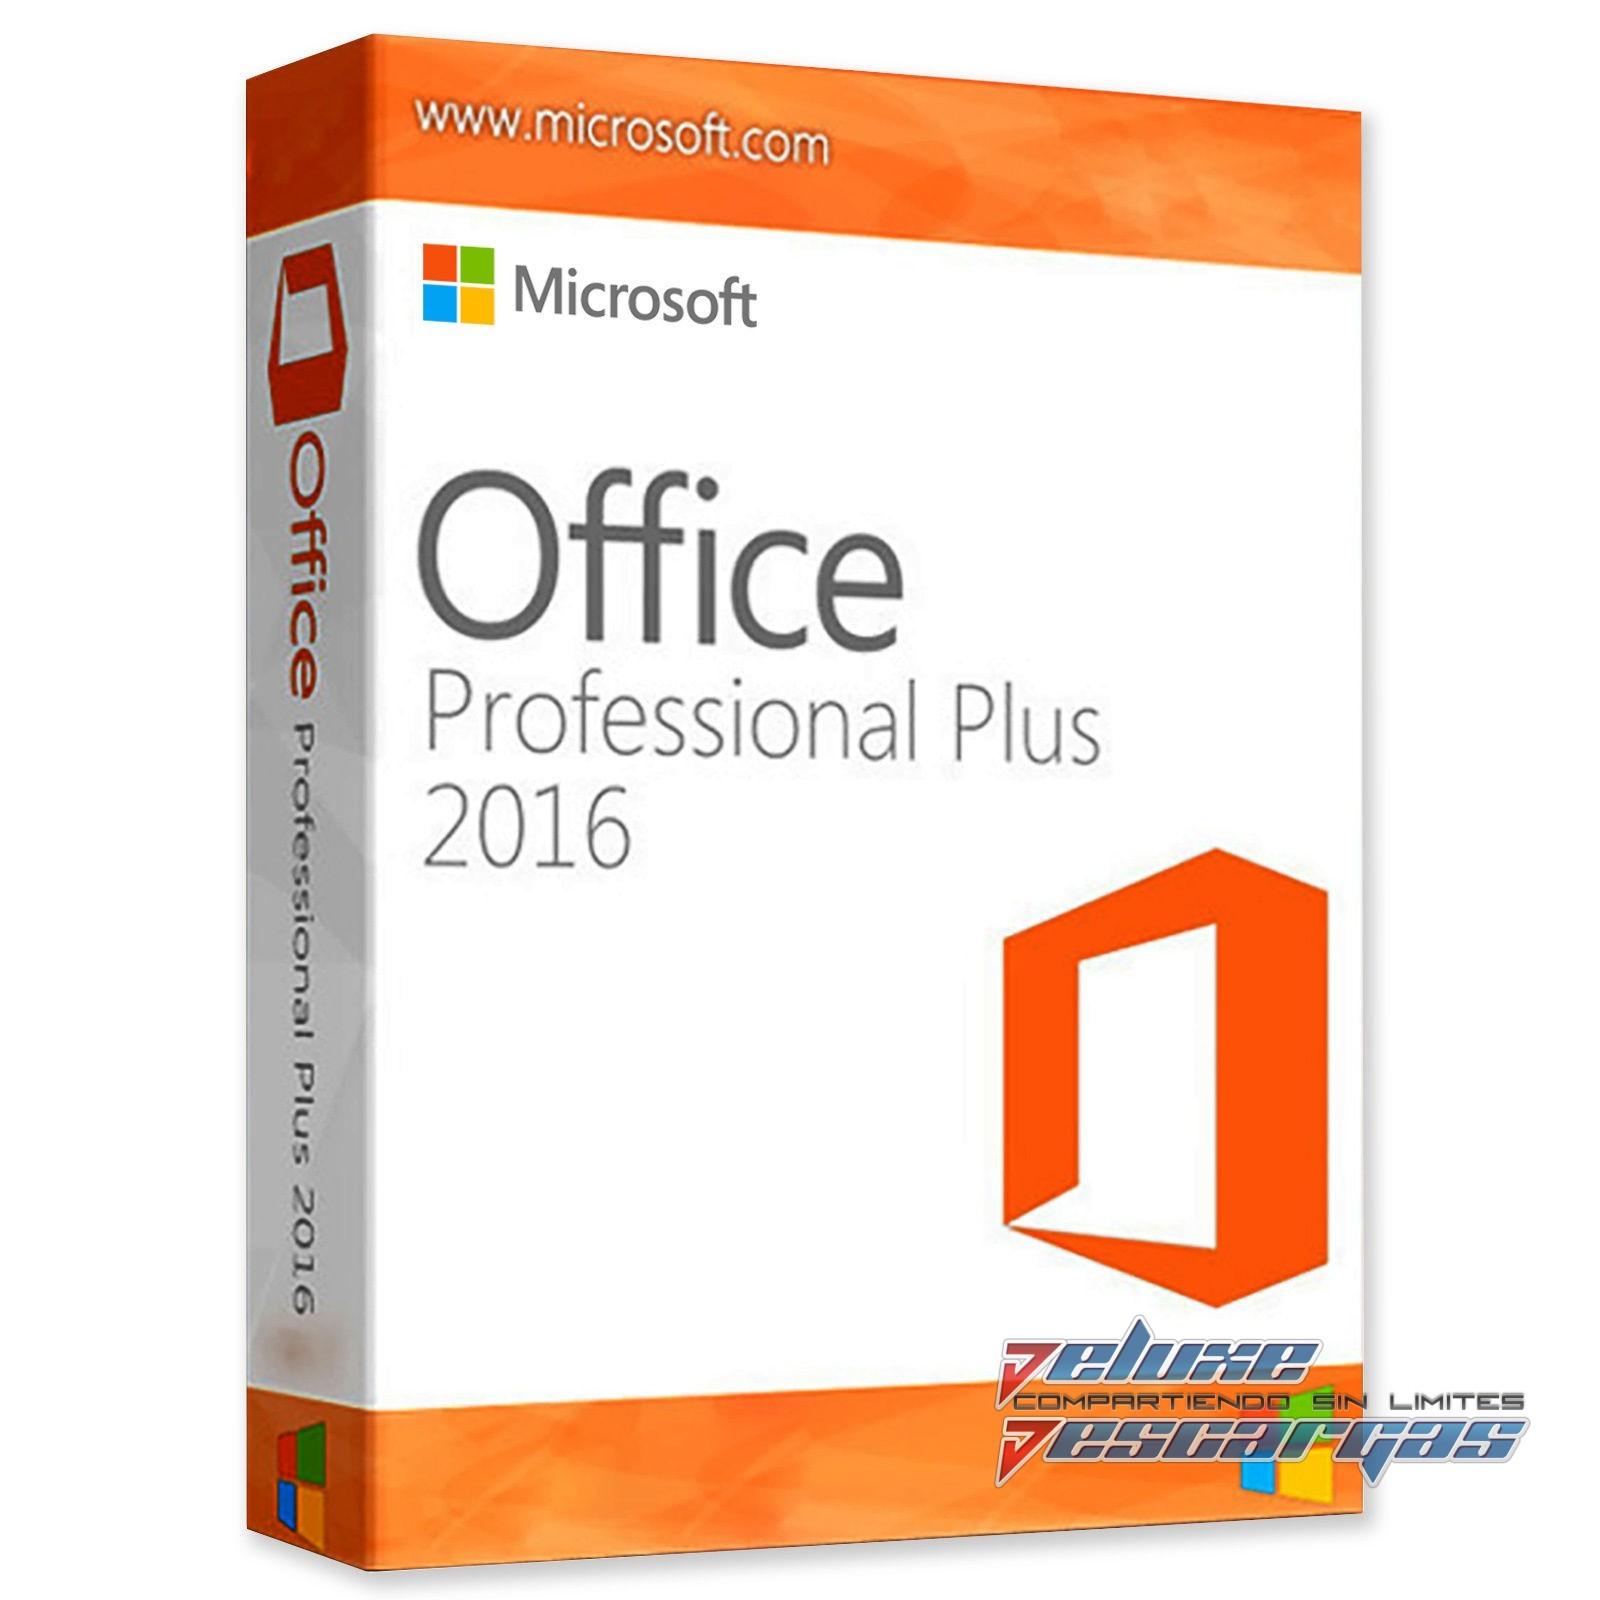 microsoft office professional plus 2016 x64 (64-bit) actualizado.iso